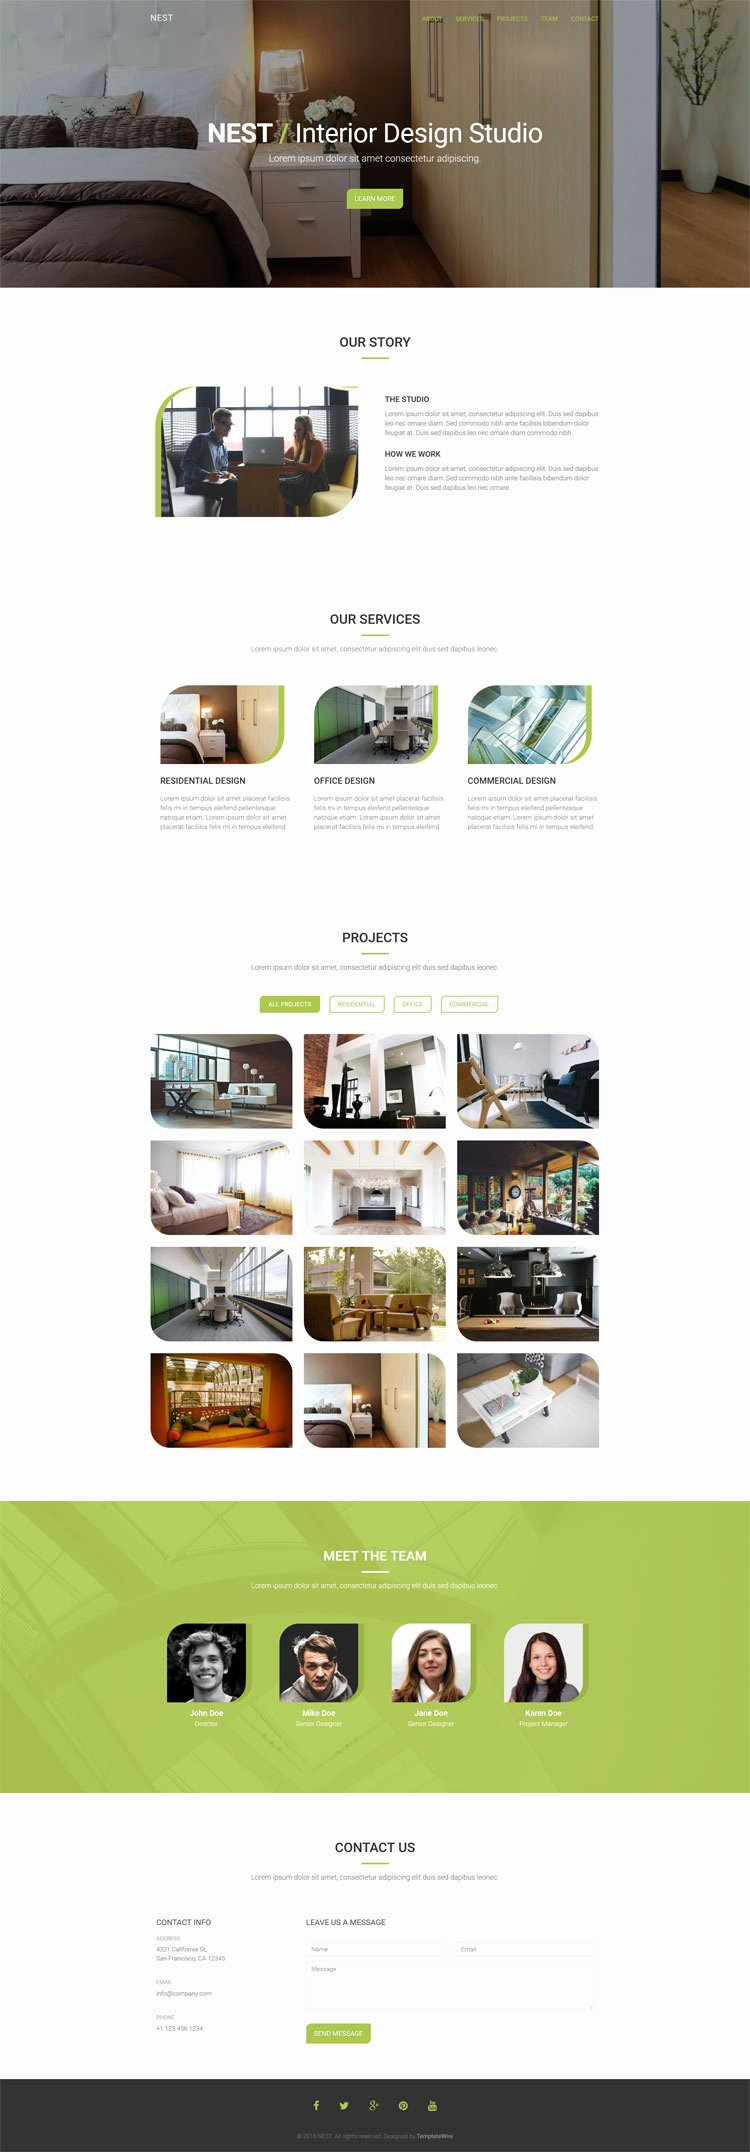 Interior Design Template Free Luxury Nest Free Interior Design Template Bootstrap Templates